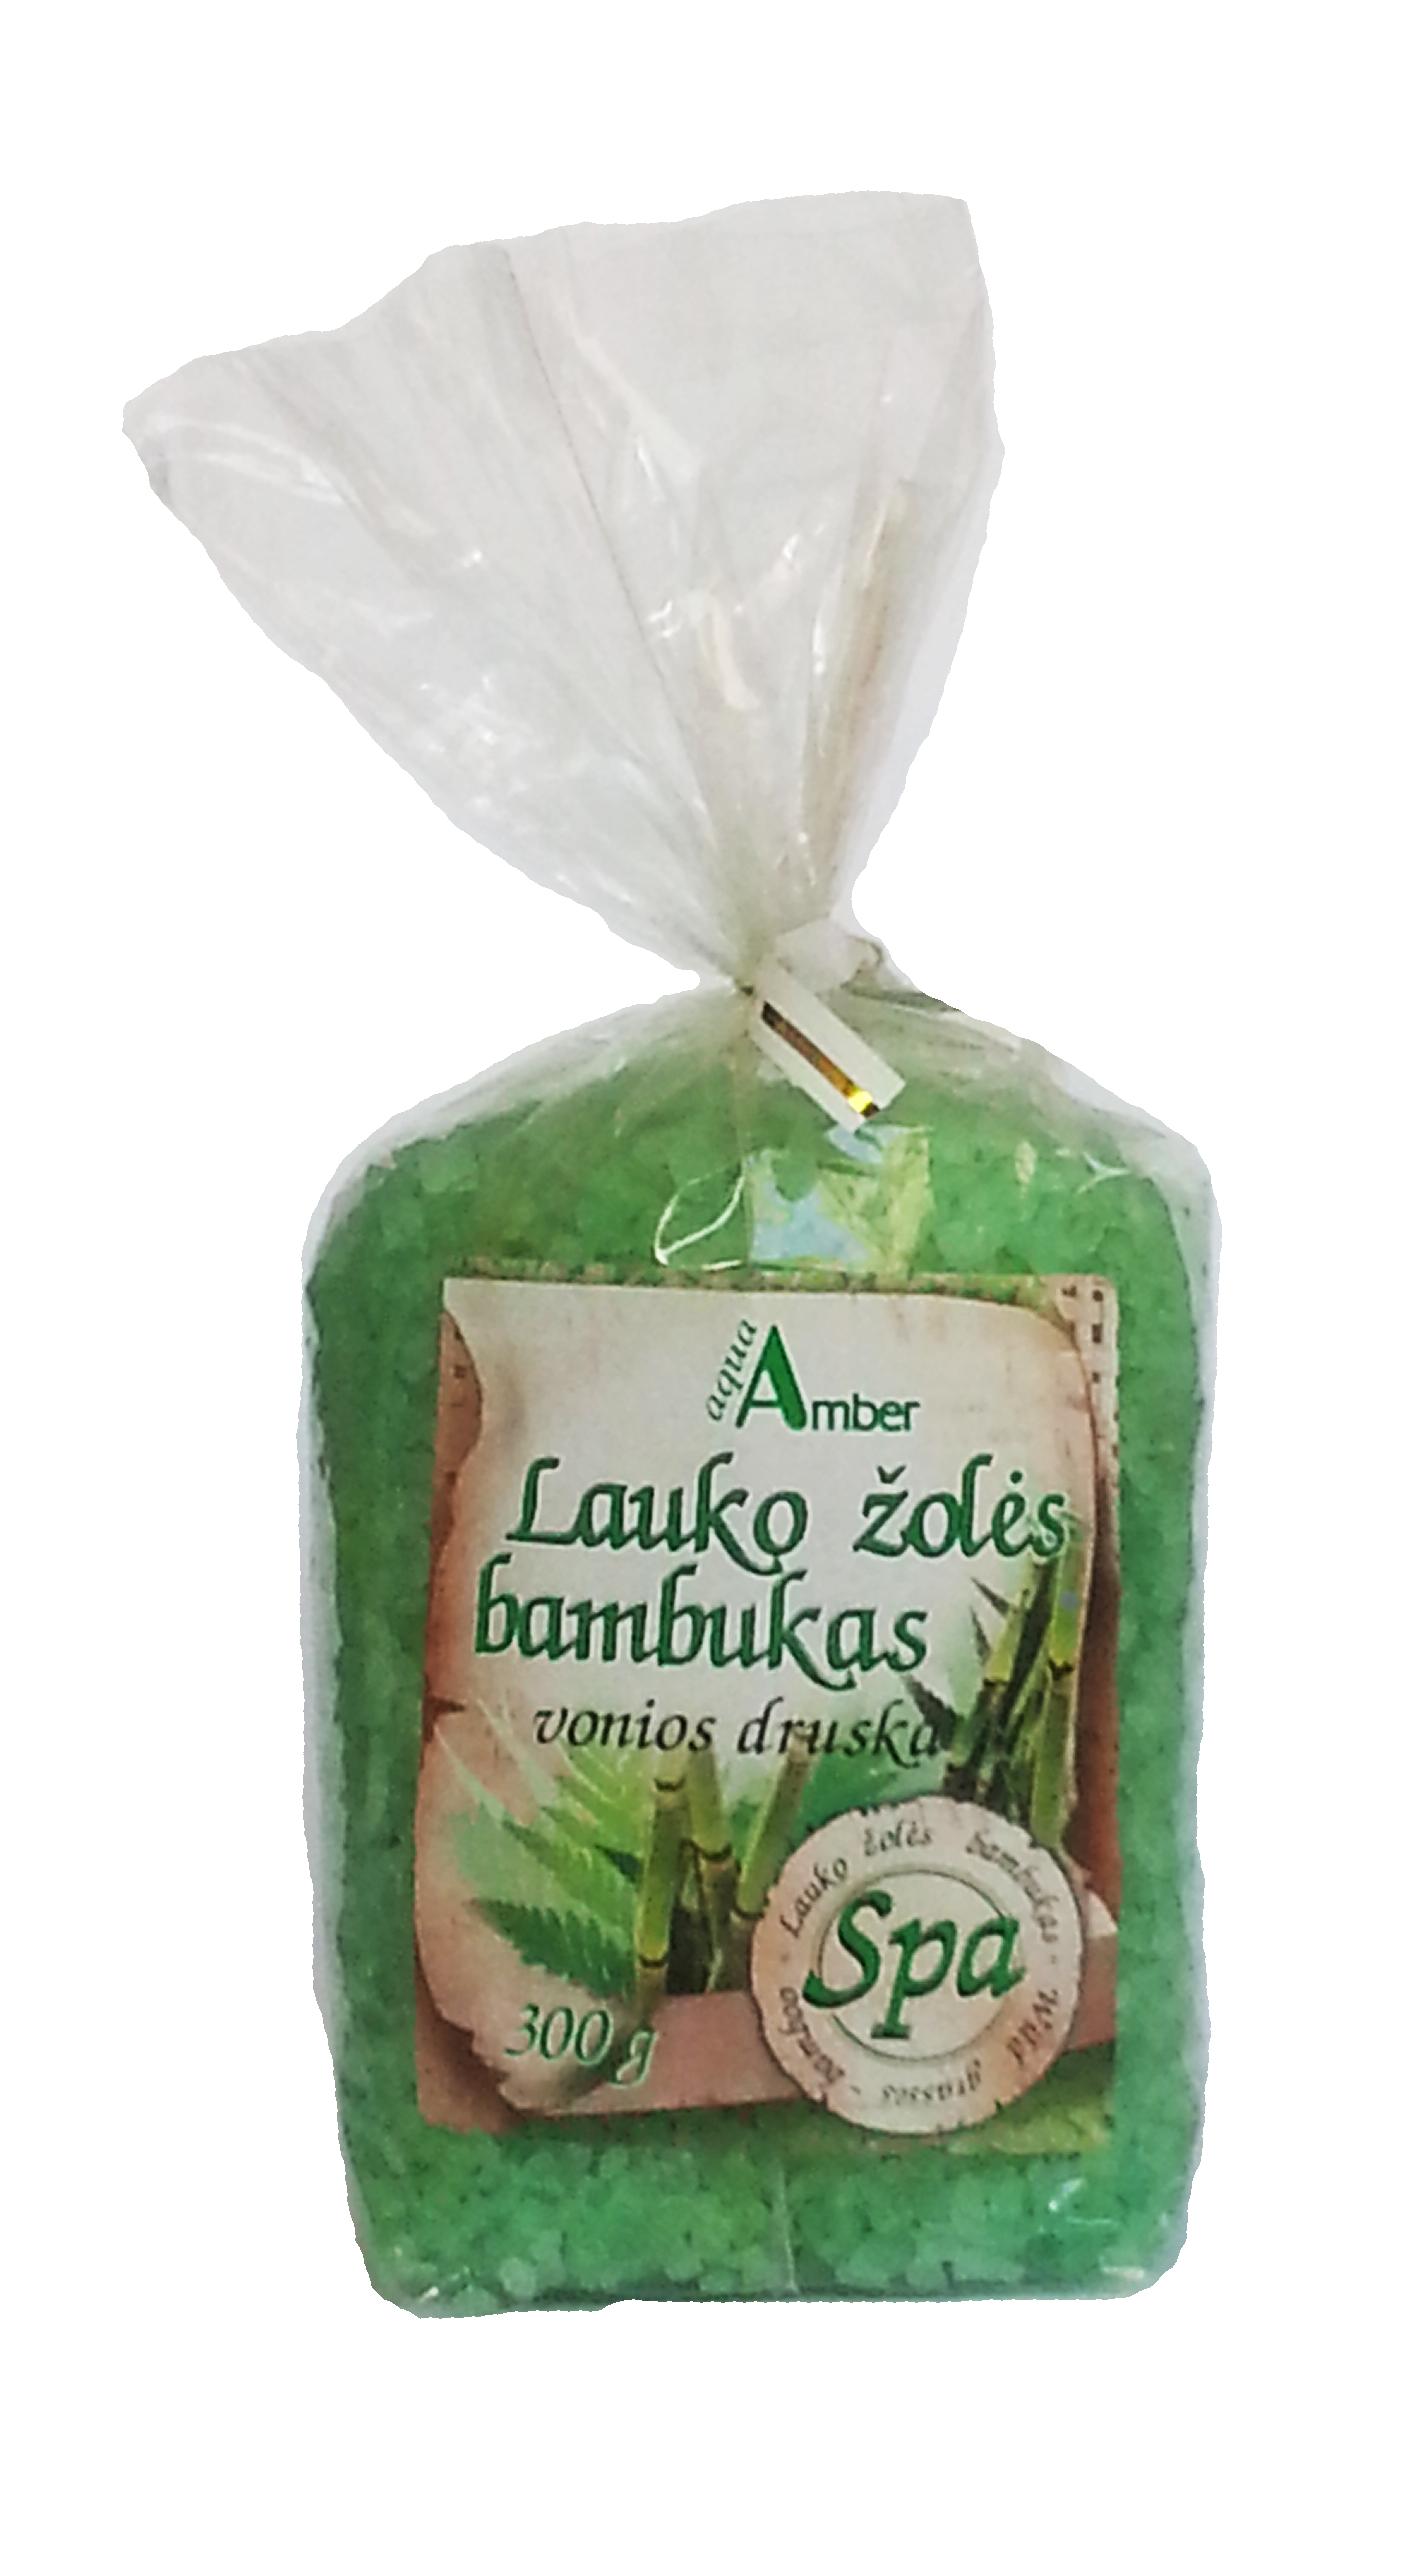 Vonios druska AQUA AMBER SPA su laukų žolėmis ir bambukais, 300g